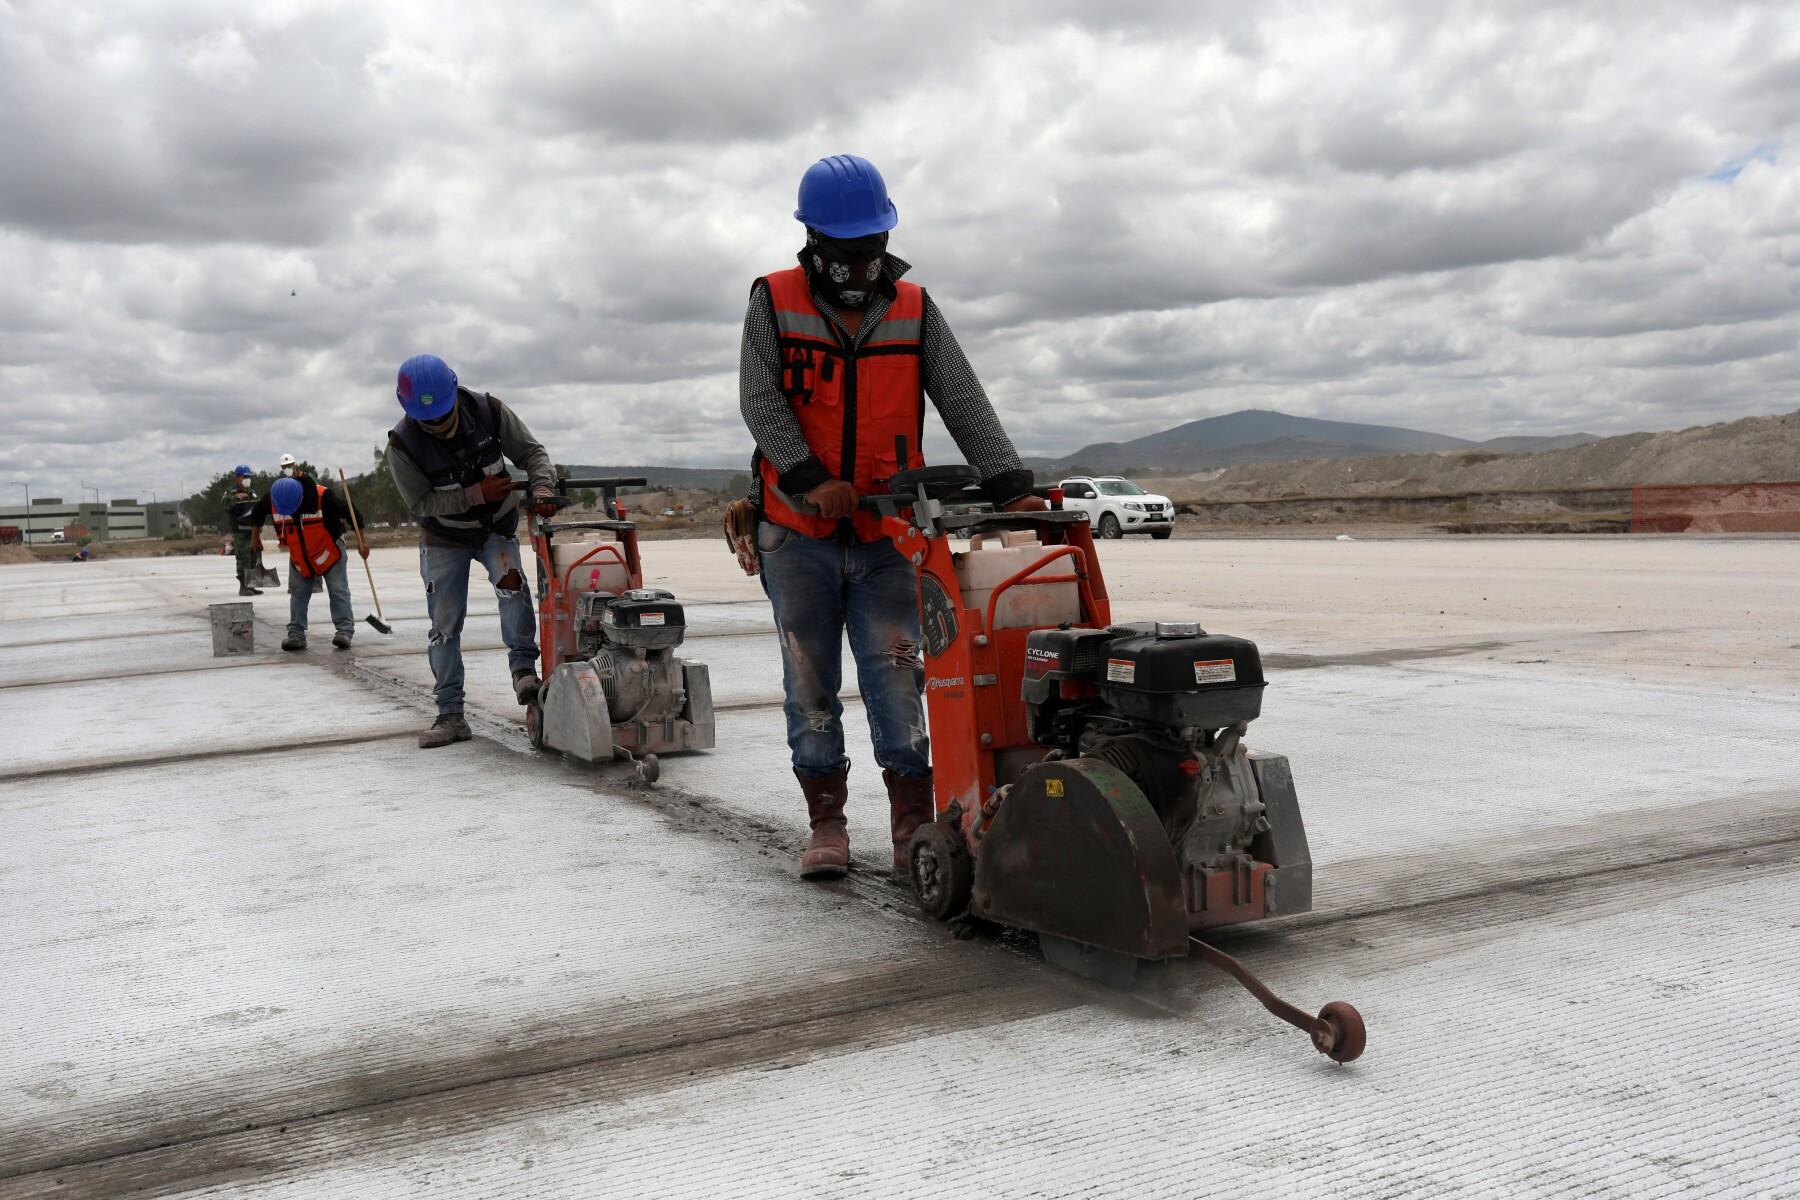 Mexico's new international airport in Zumpango